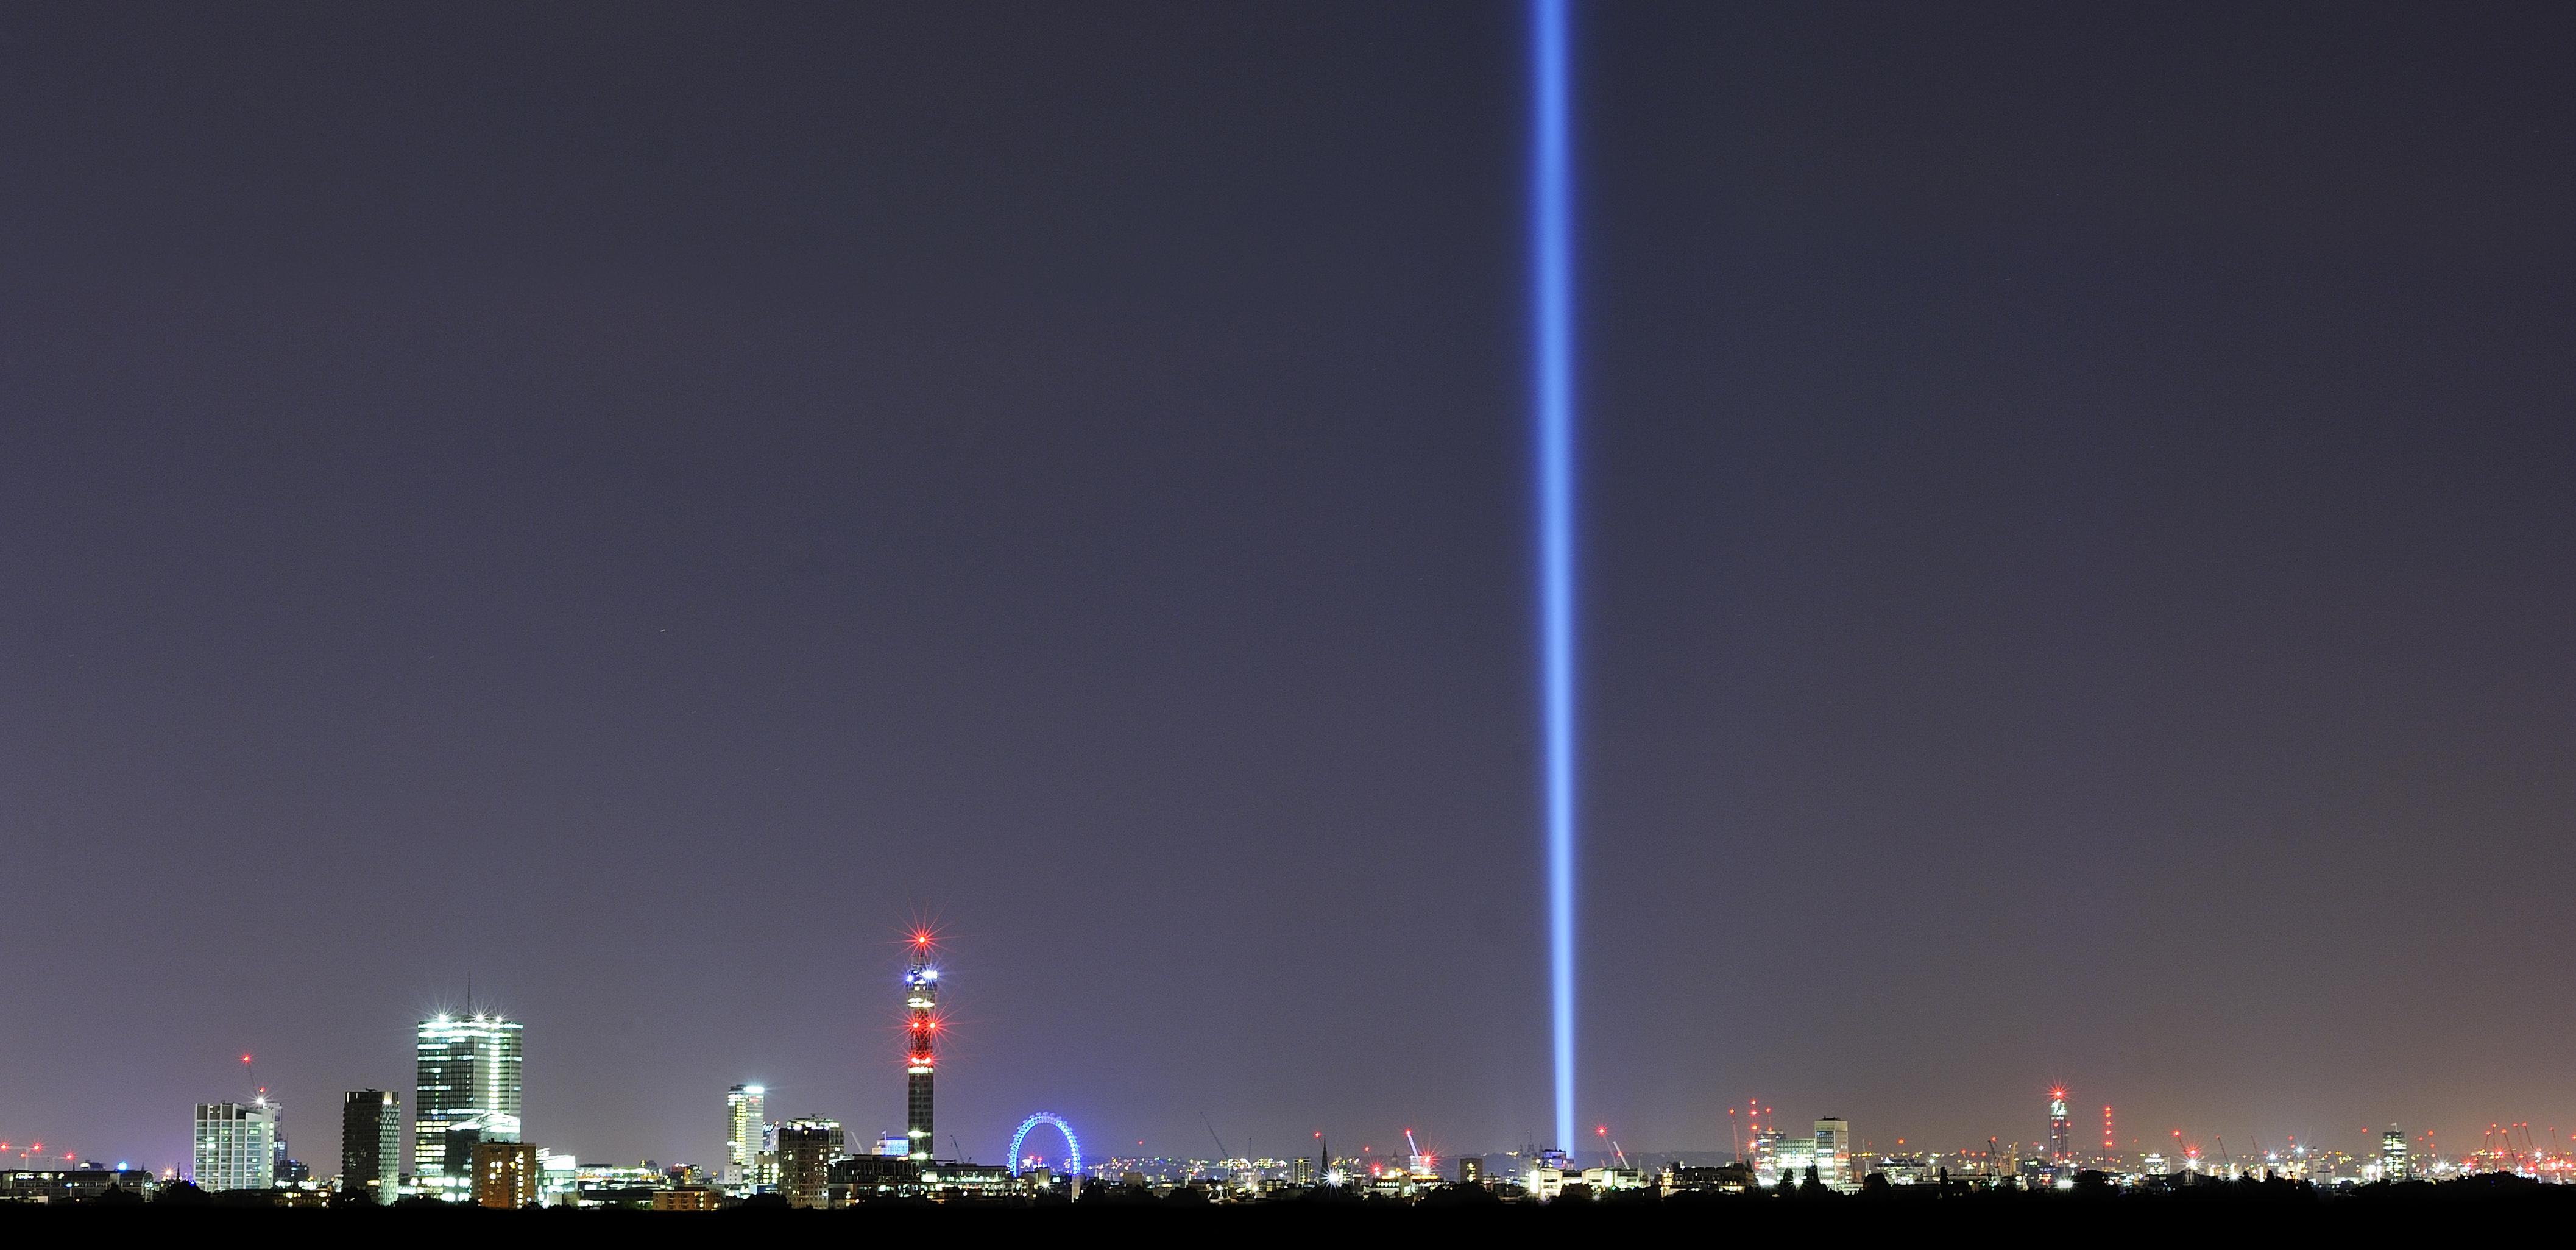 spectra, Ryoji Ikeda. Image credit - Thierry Bal